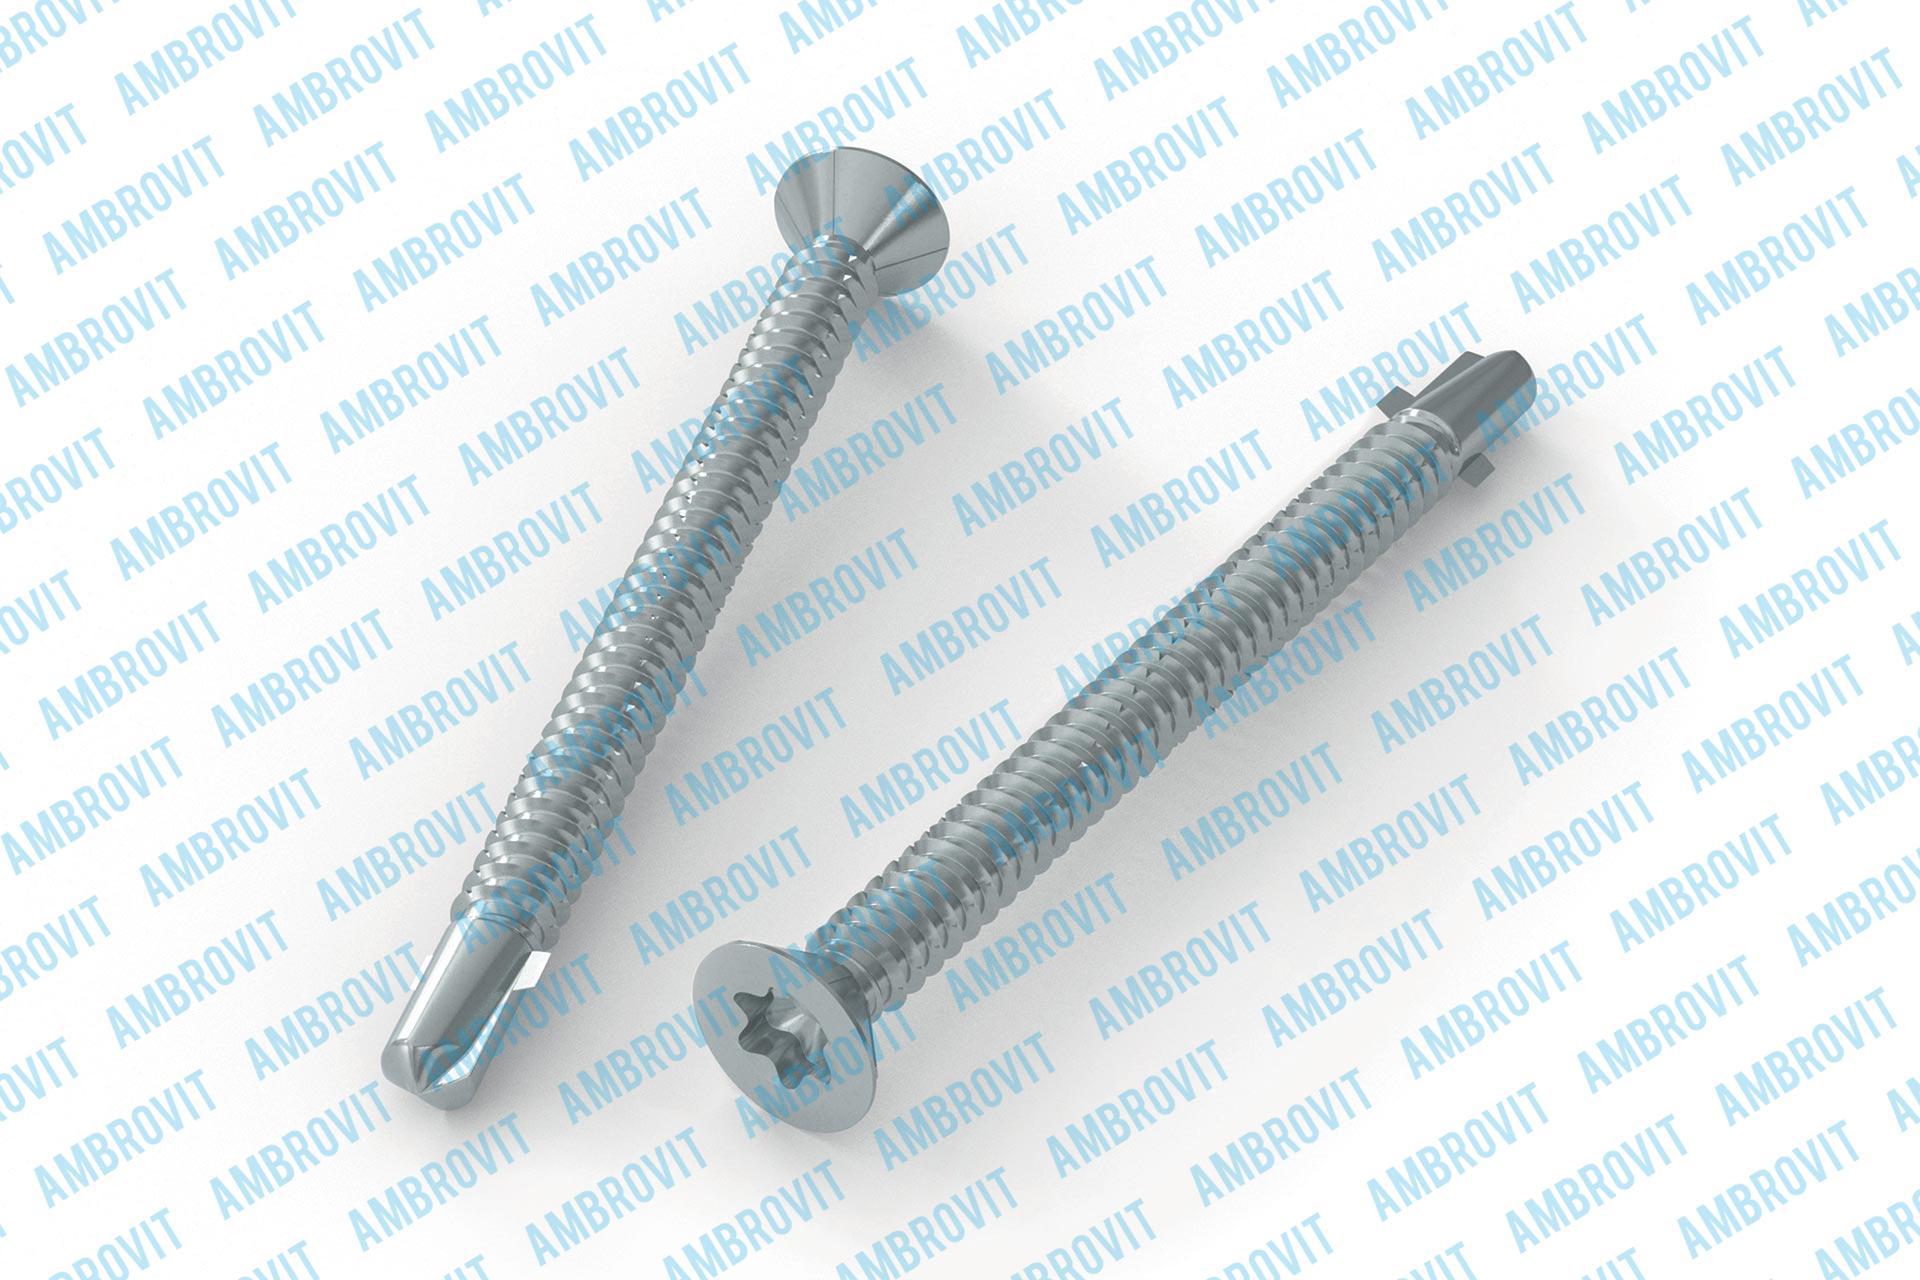 Self-drilling screws tx flat head w/ribs under head cutting thread and special wings